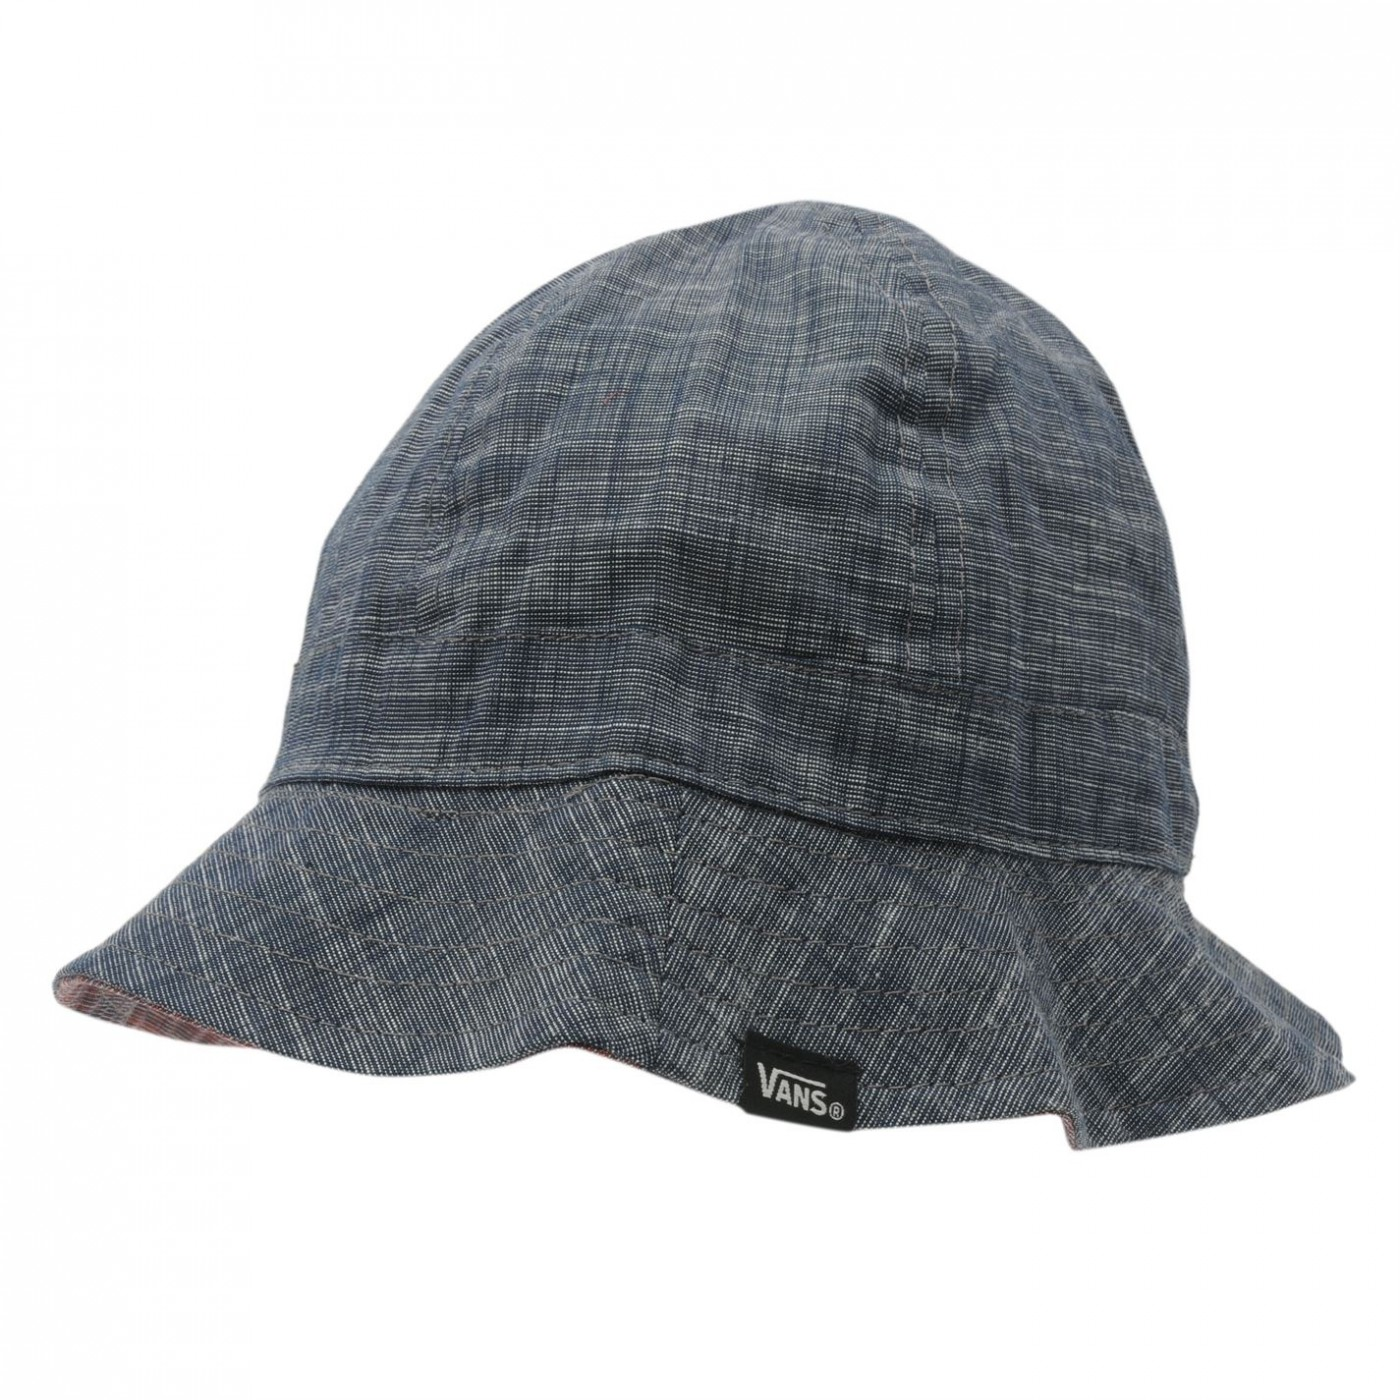 Kaeket Vans - Montera Bucket Hat - Jeftinije.hr 6568fb063856